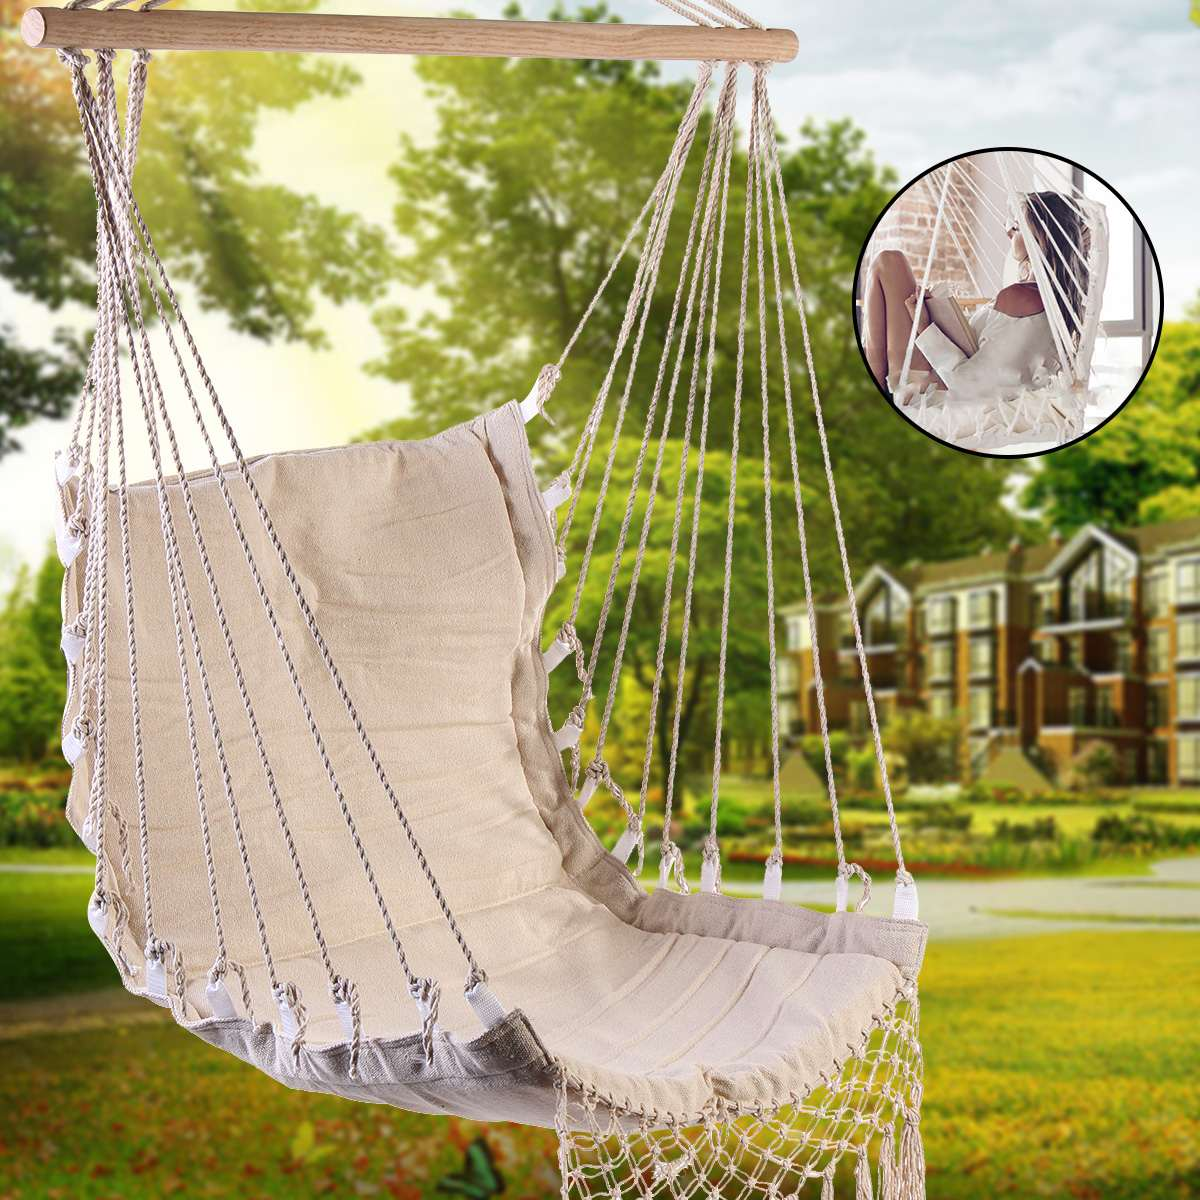 Cotton Canvas Hammock Chair Swing Hanging Chair College Dormitory Chair Indoor Outdoor Garden Kids Adult Furniture Hanging Swing